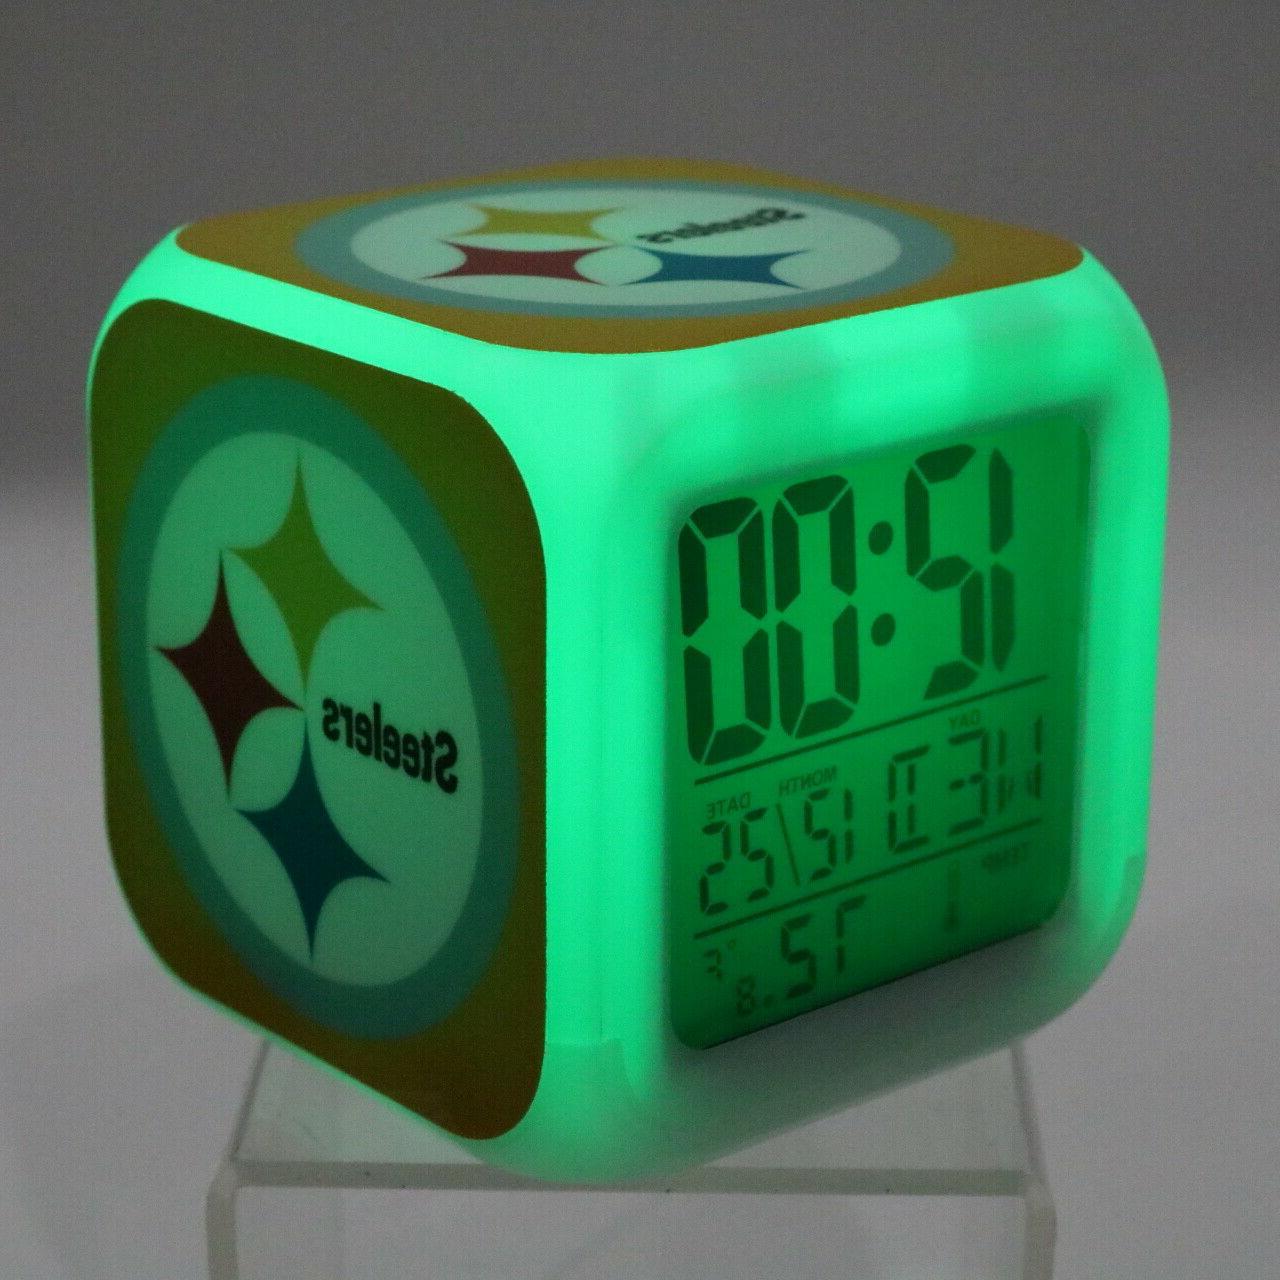 Pittsburgh LED Alarm Clock Decor Gift